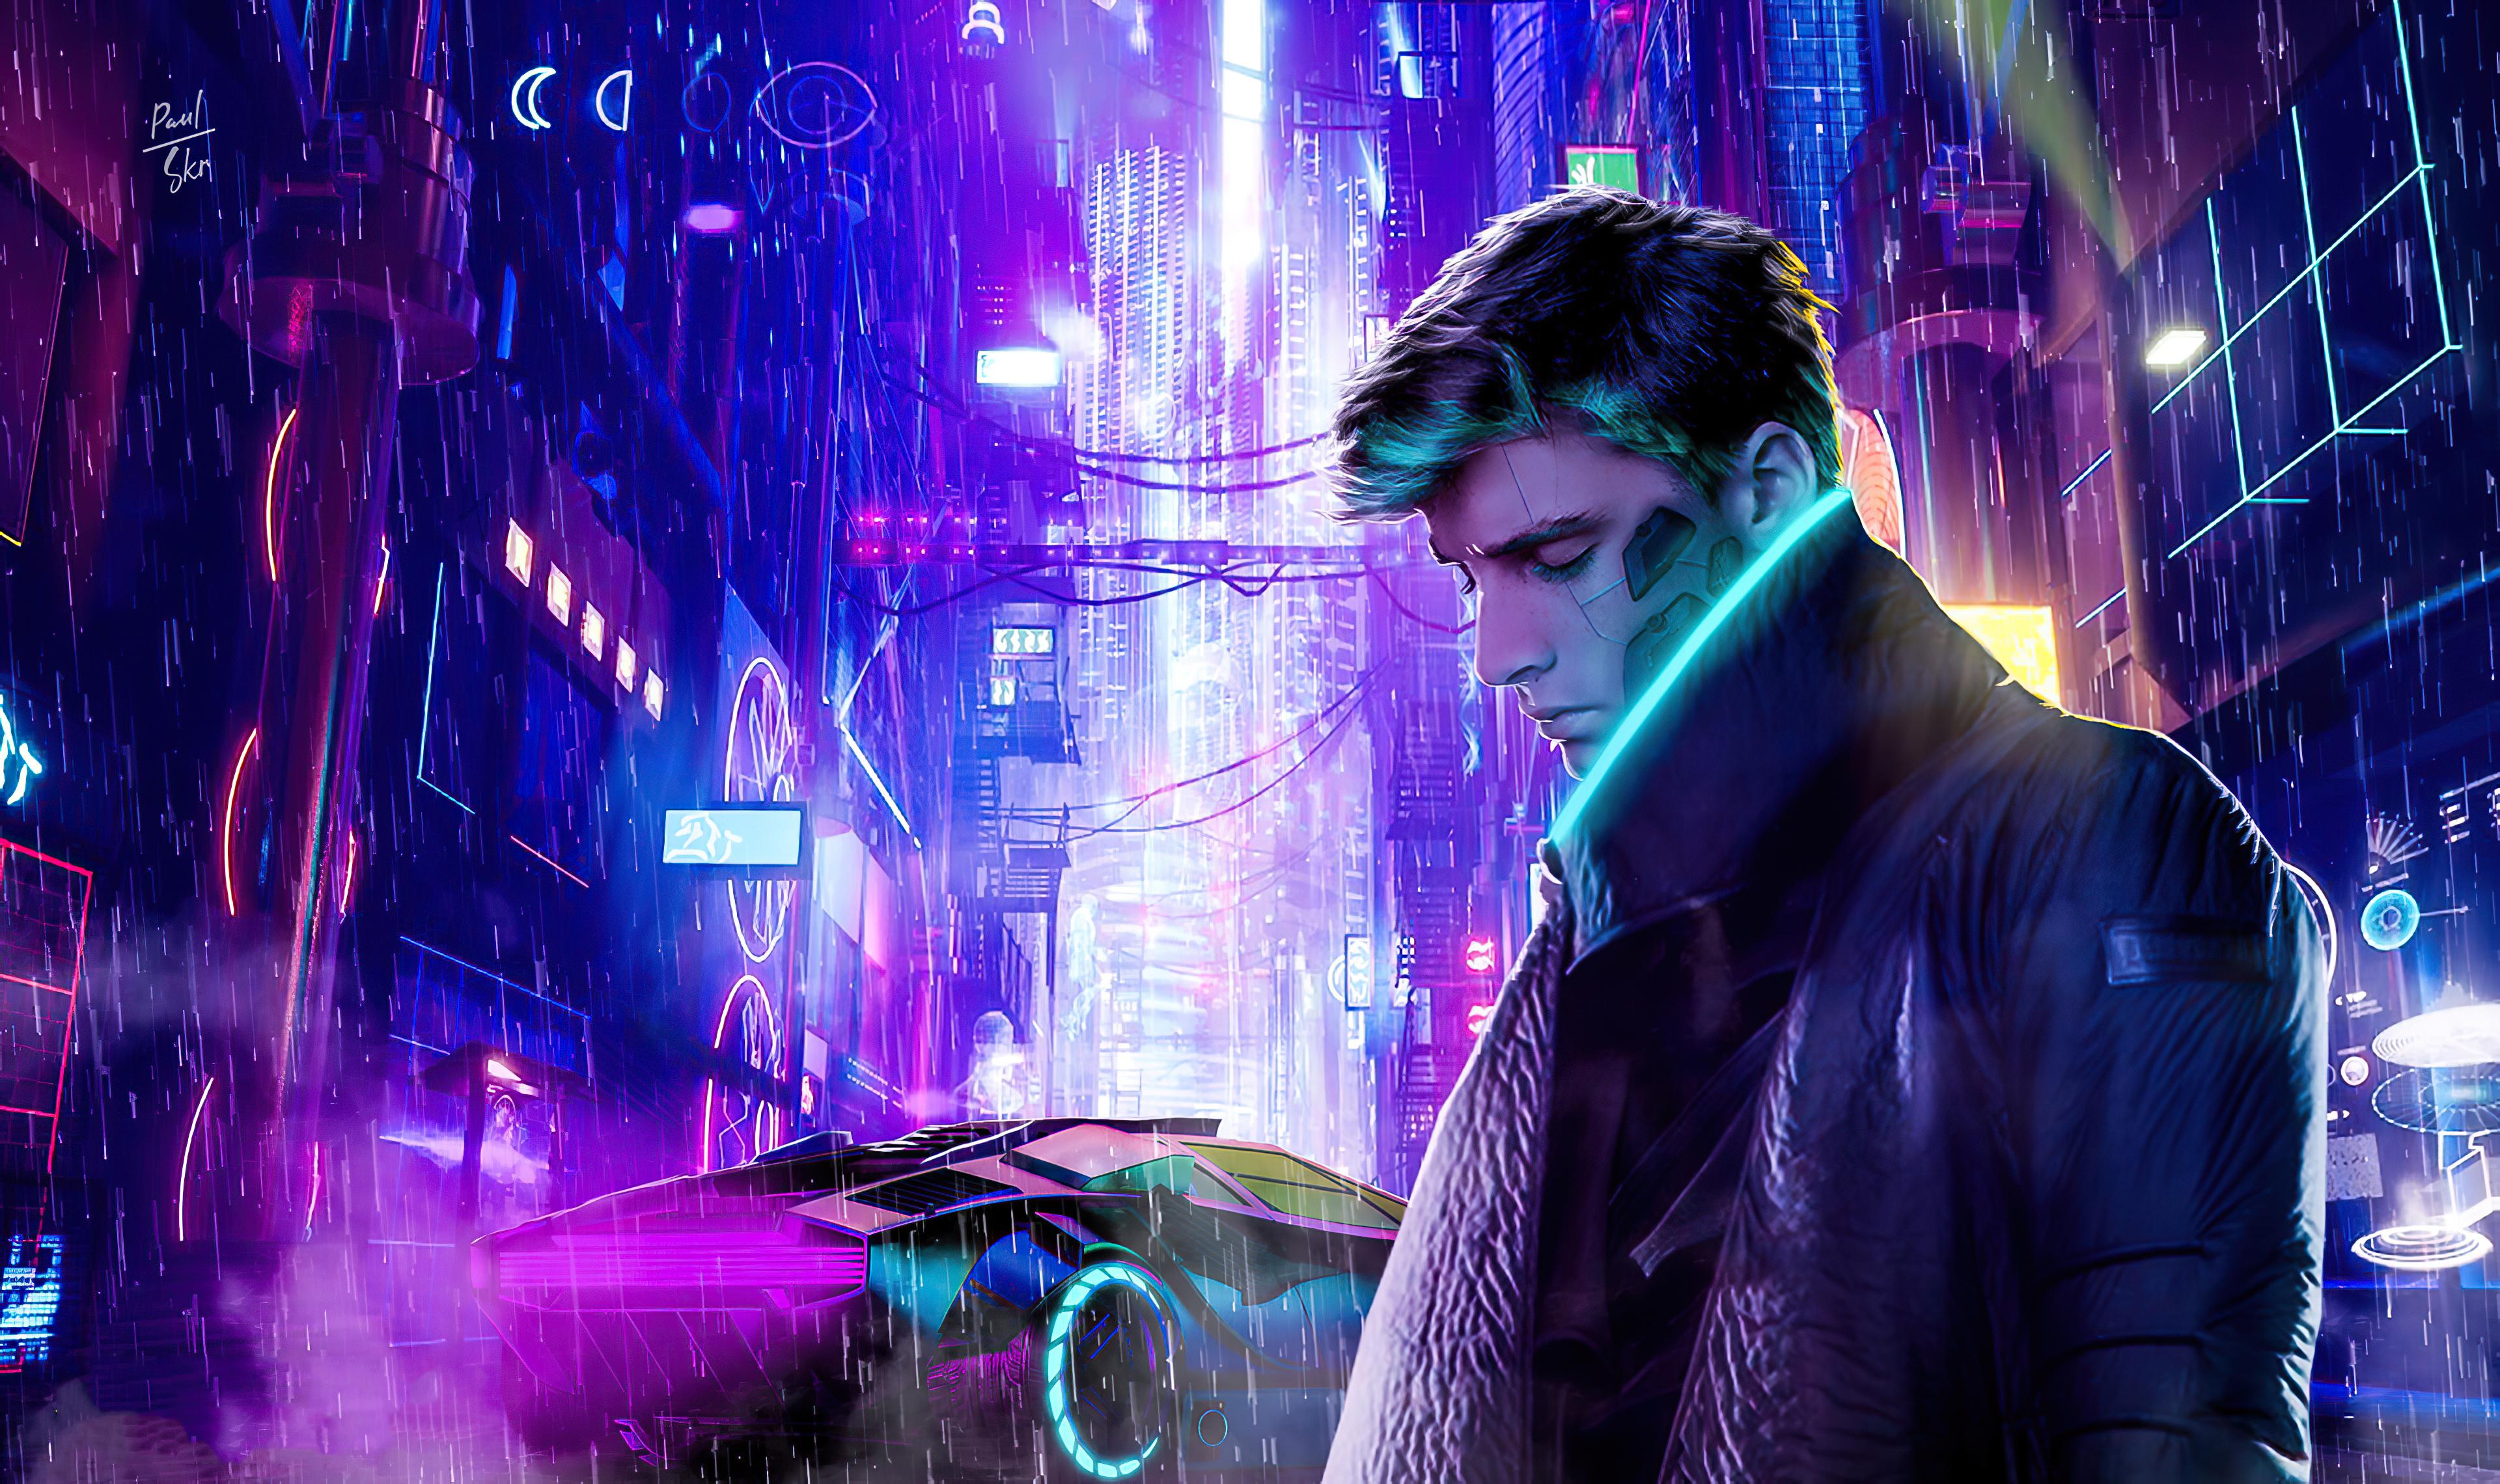 Cyberpunk 2077 Cosplay 2020, HD Games, 4k Wallpapers ...